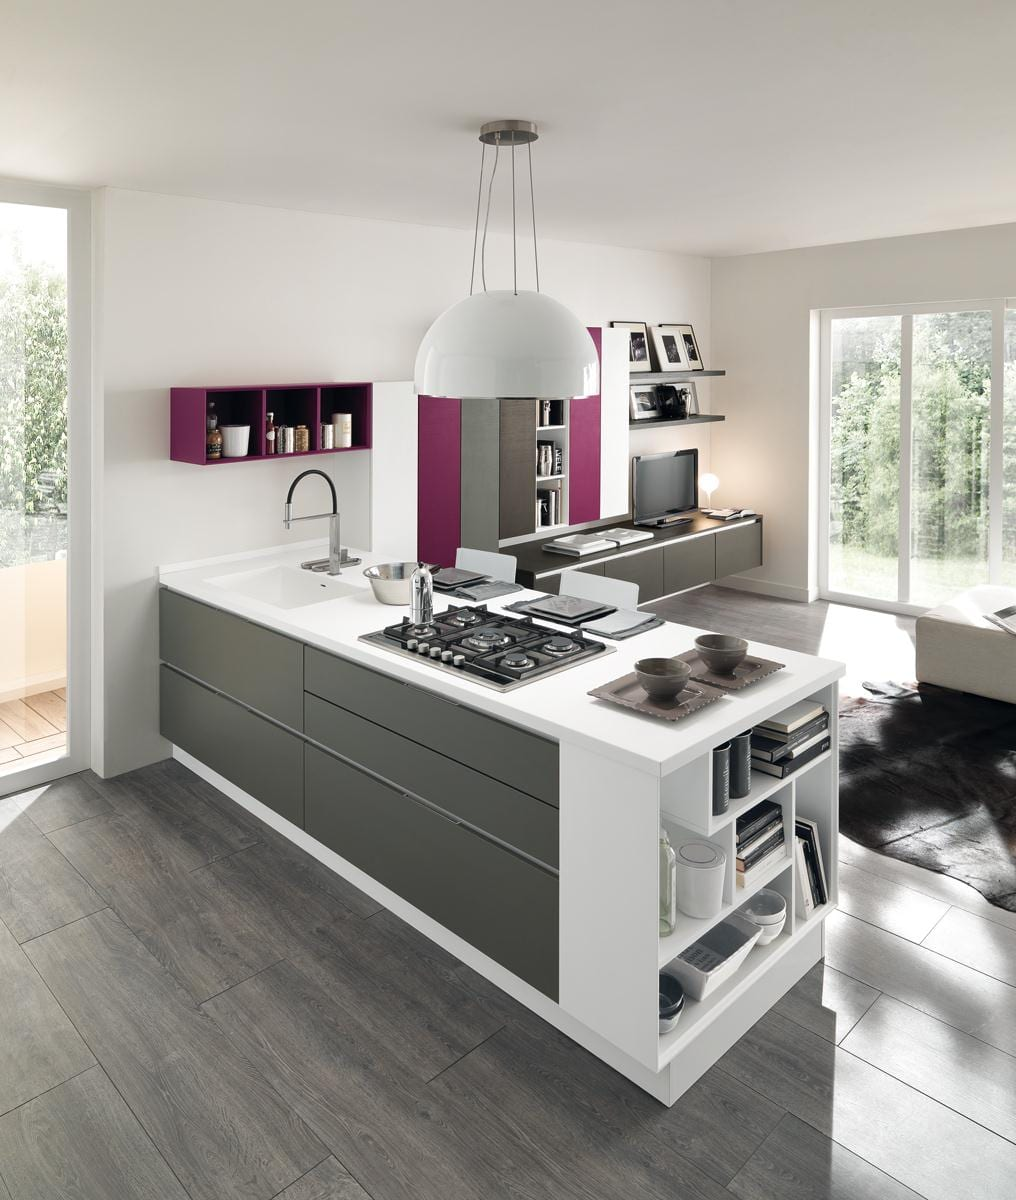 Cucine usate a bologna cool cucina vintage monoblocco for Arredamento usato parma